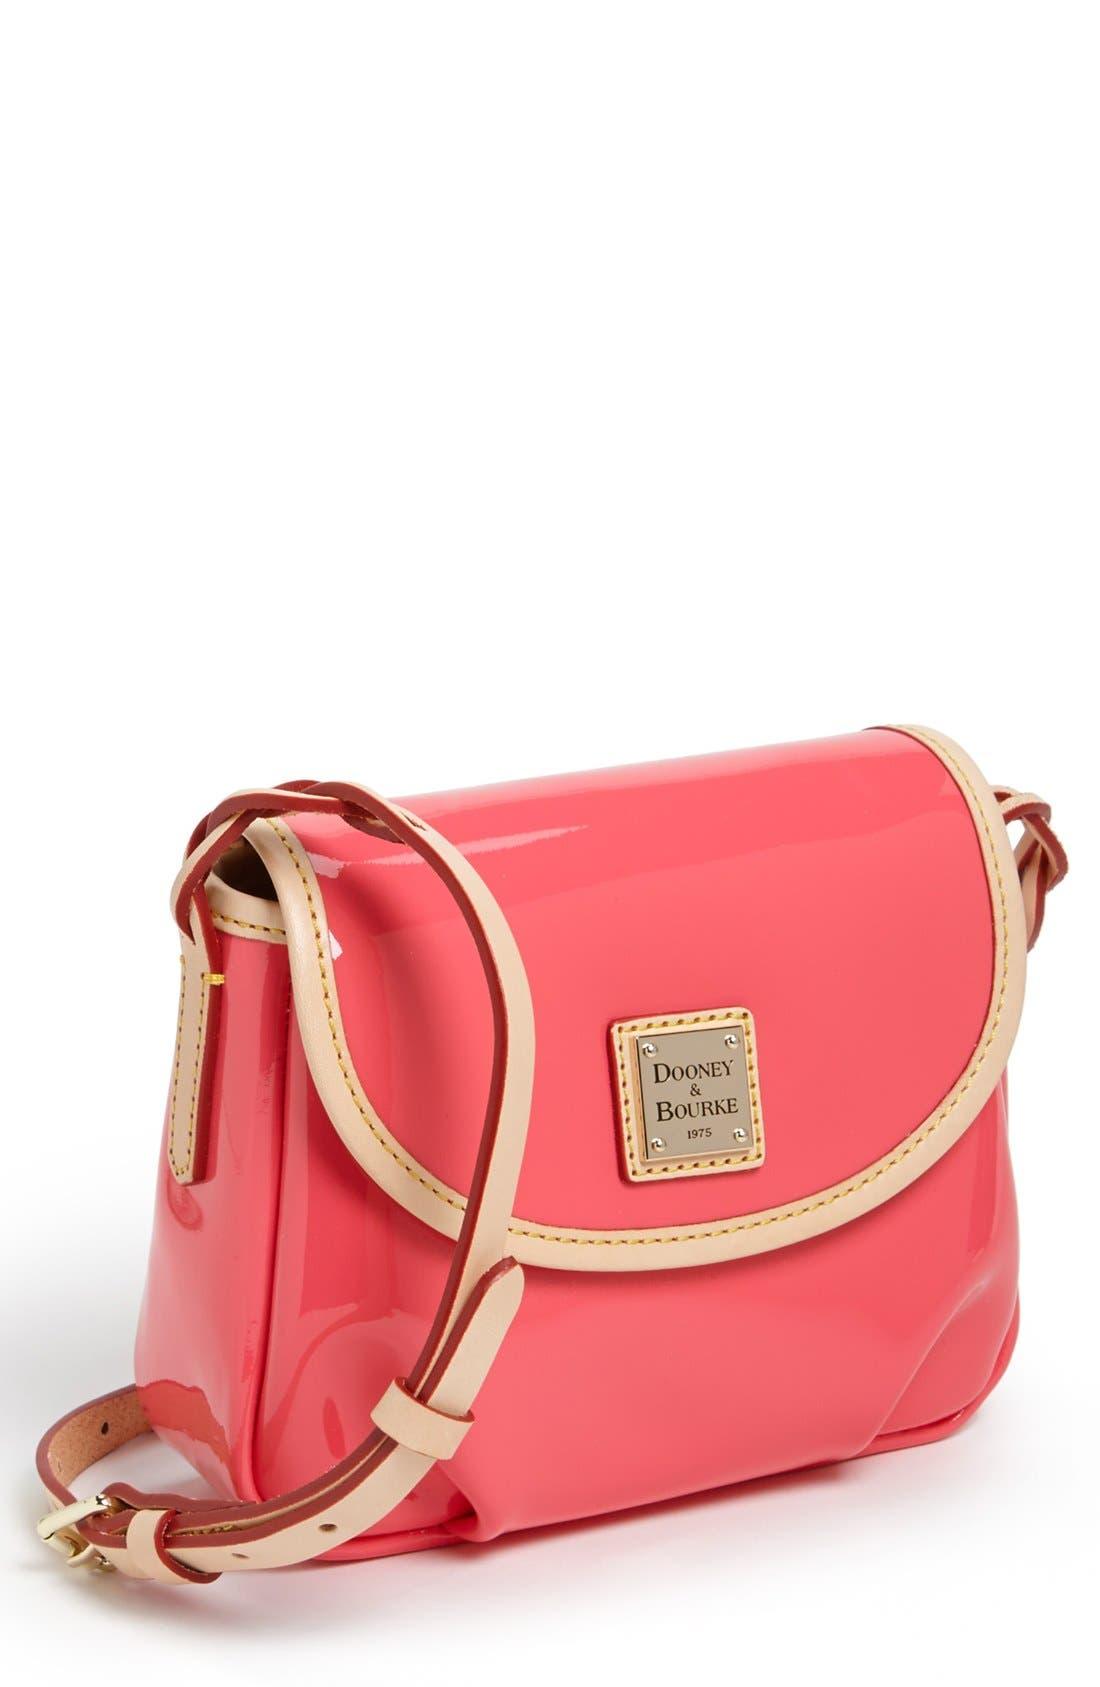 Main Image - Dooney & Bourke Patent Leather Crossbody Bag